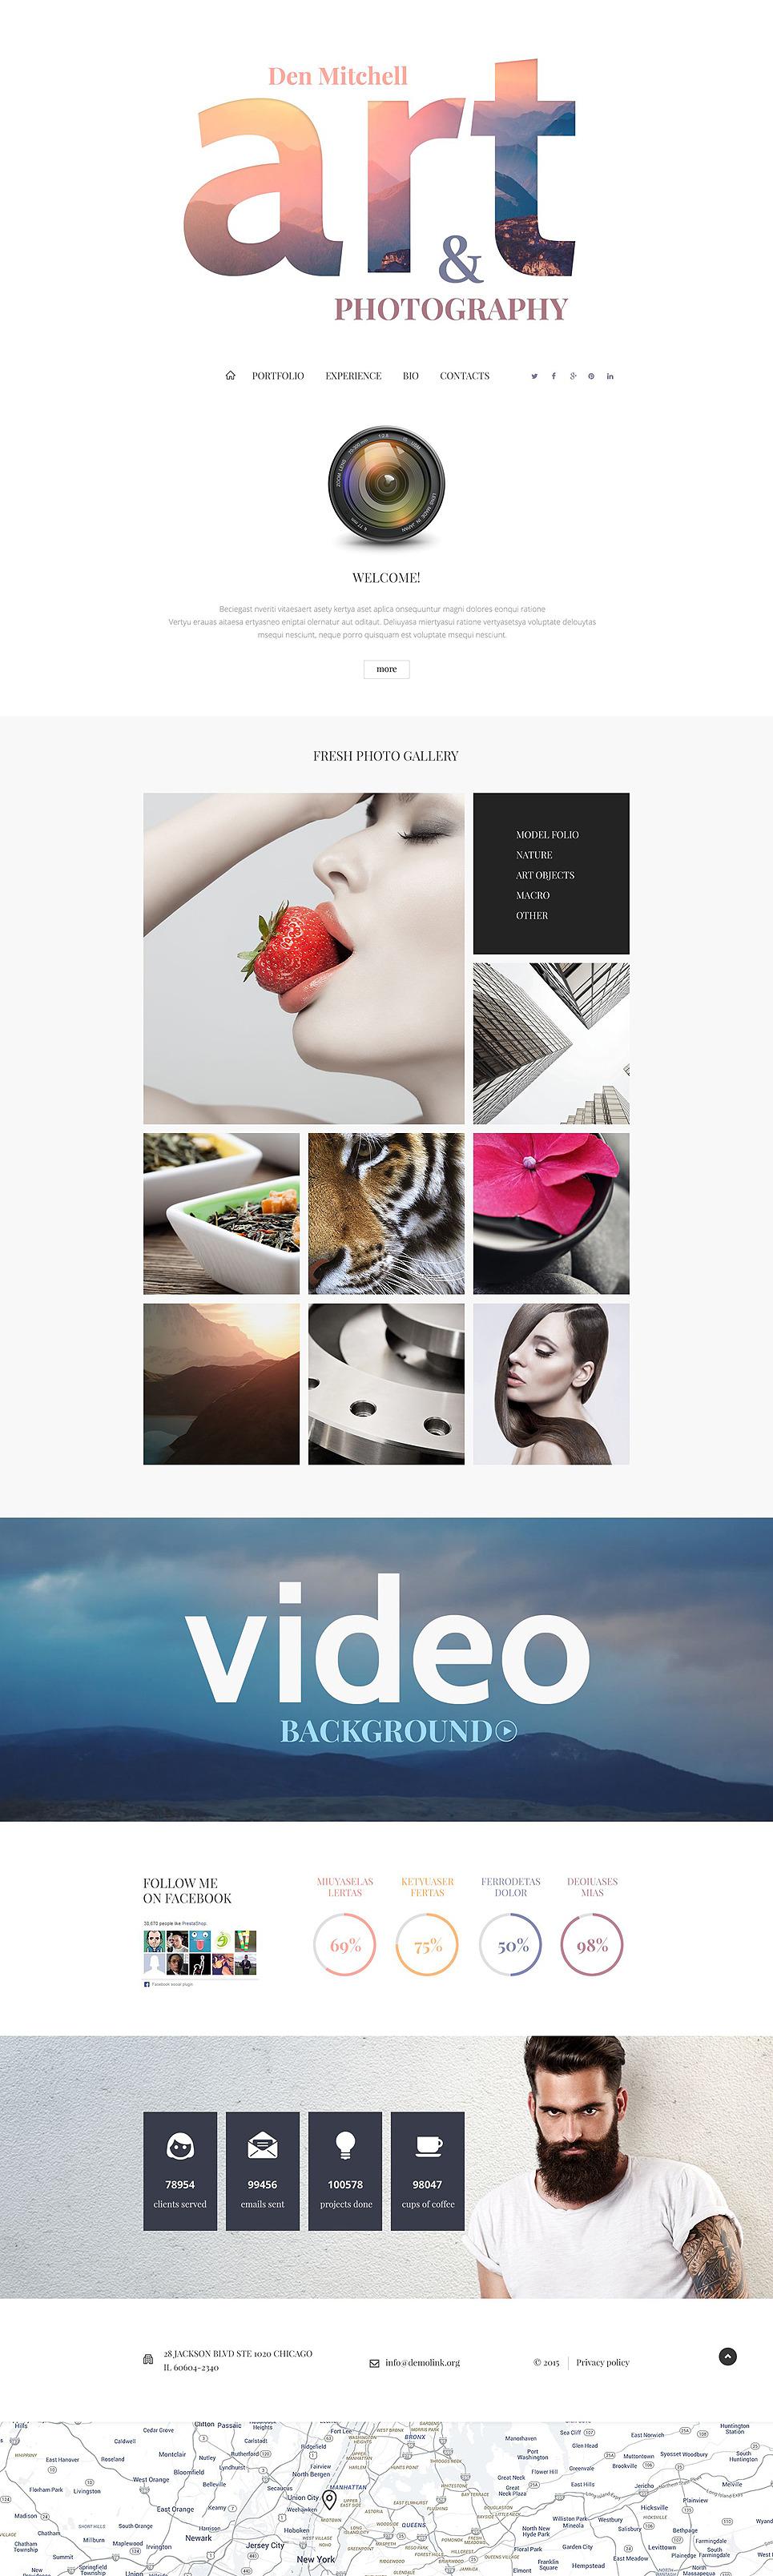 Professional Photographer Joomla Template New Screenshots BIG